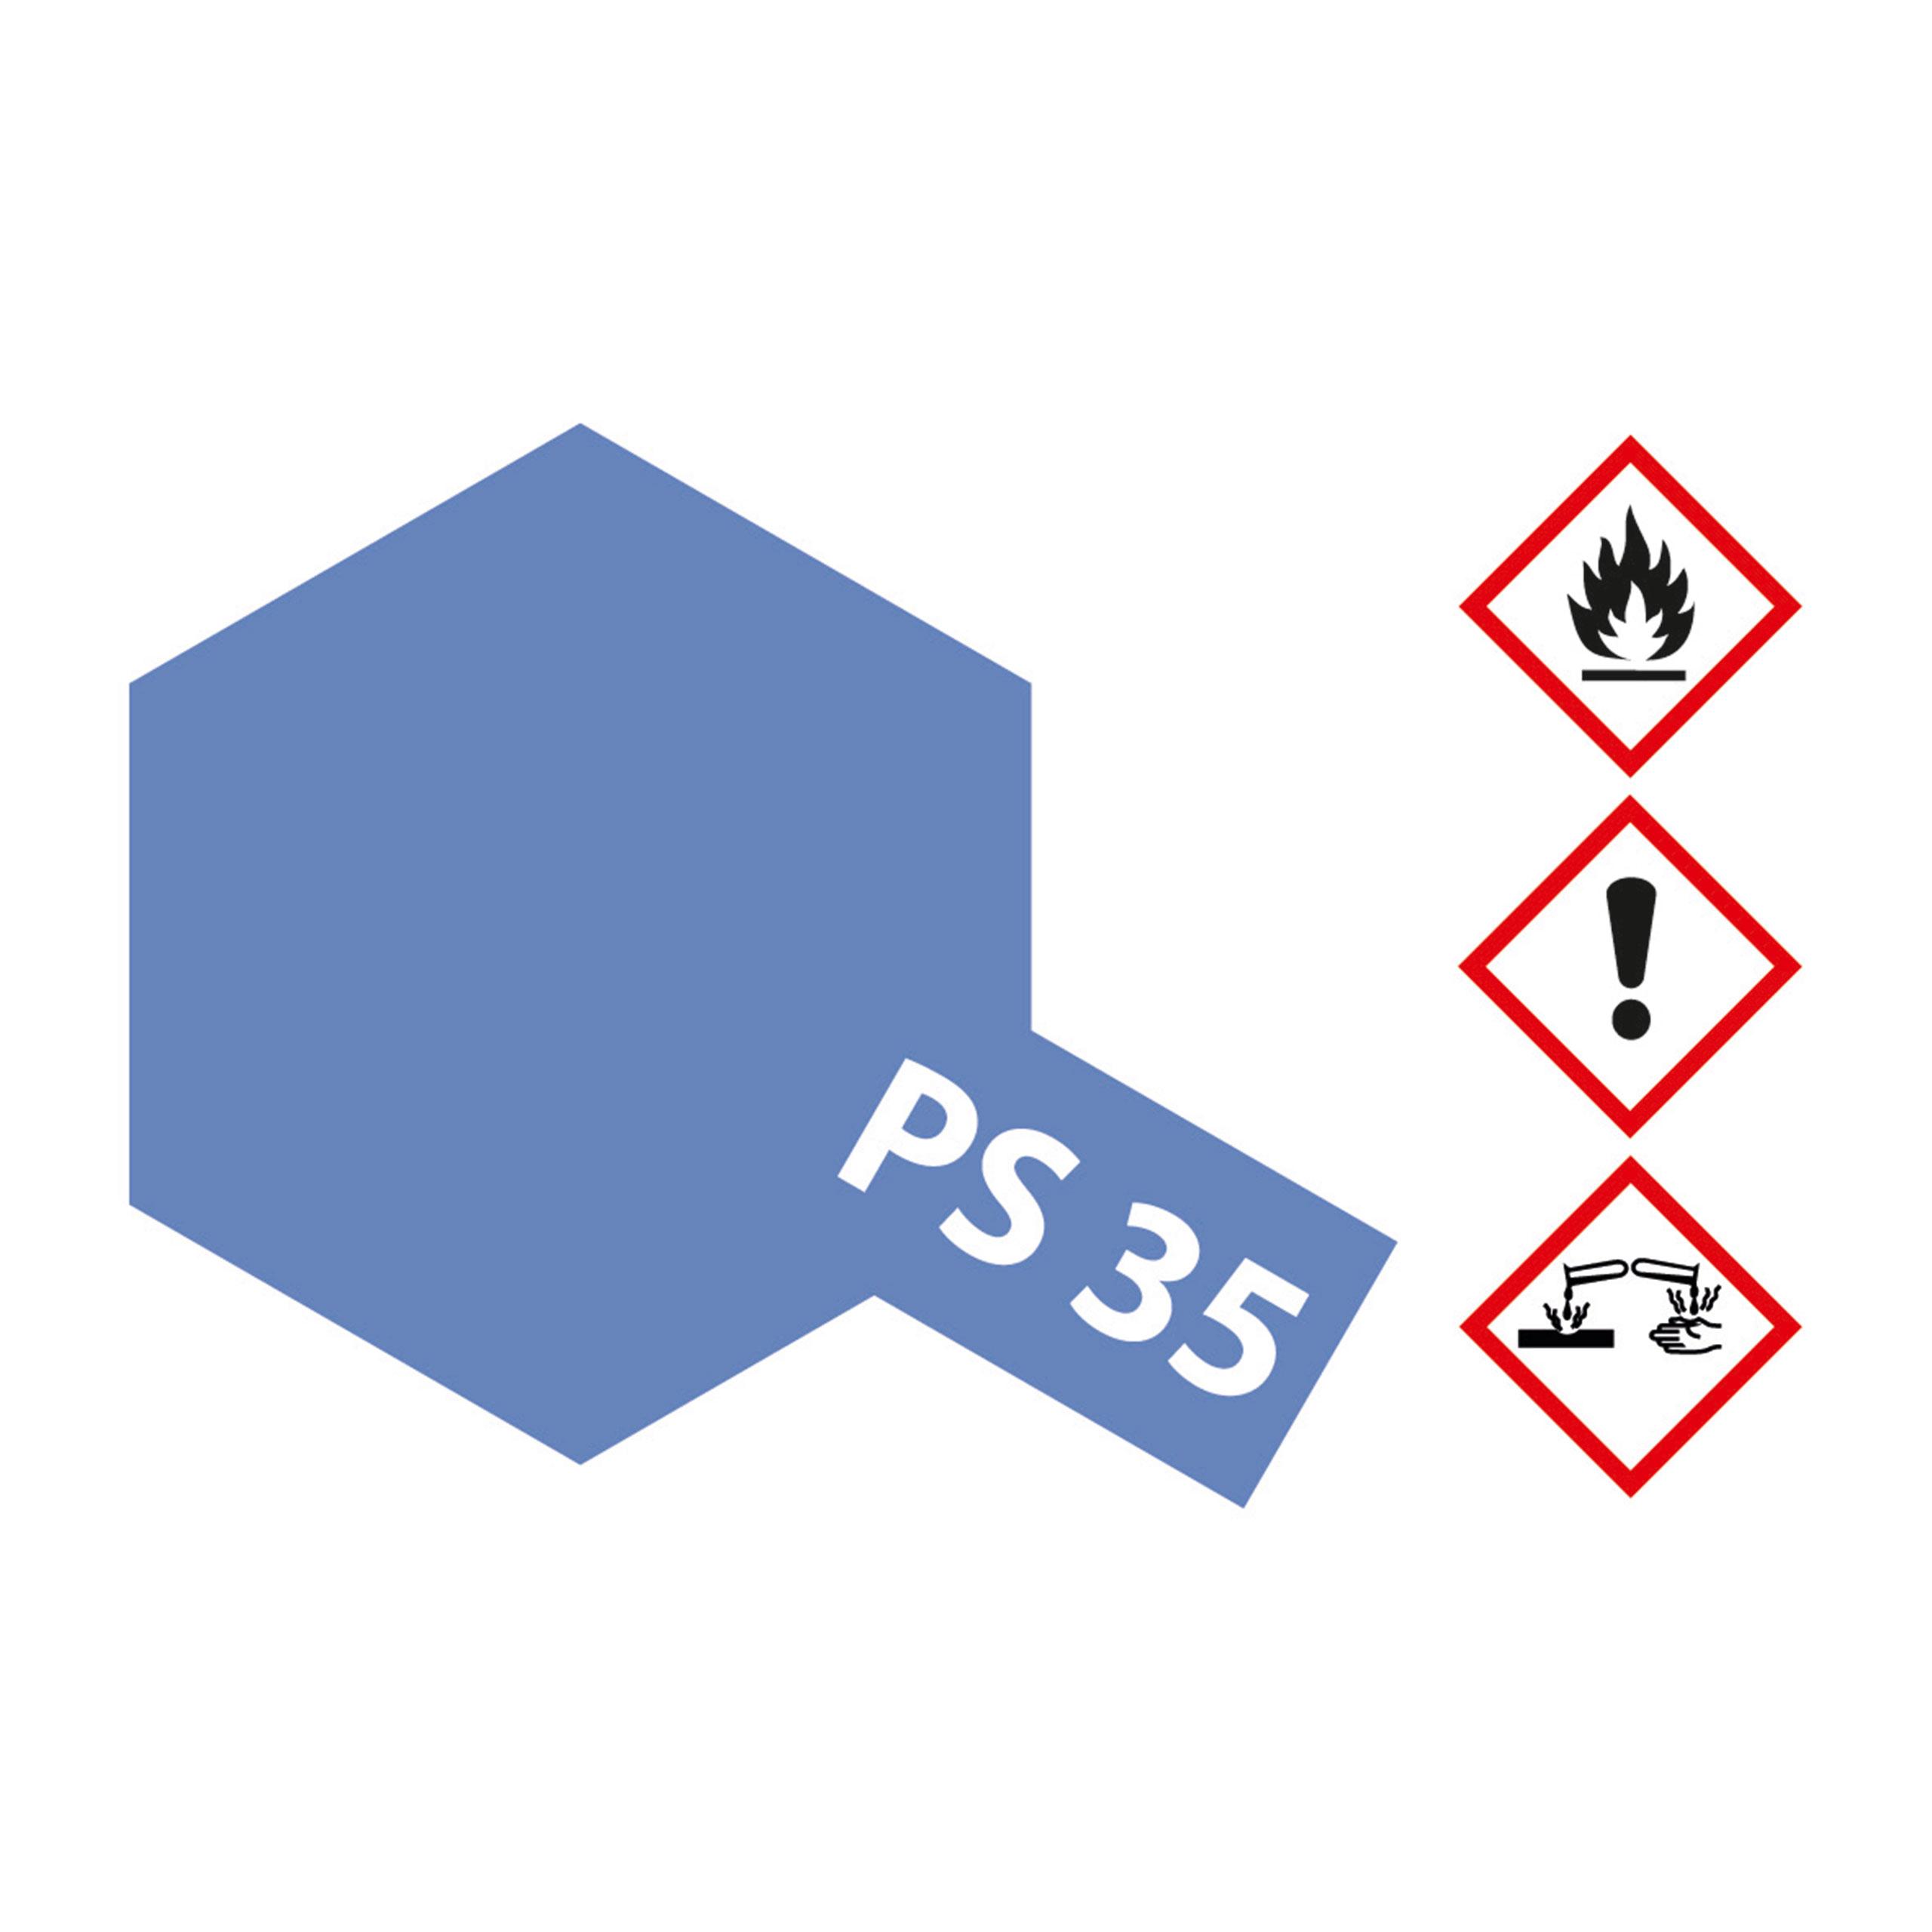 PS-35 Blau-Violett Polycarb. - 100ml Sprayfarbe Lexan - Tamiya 300086035